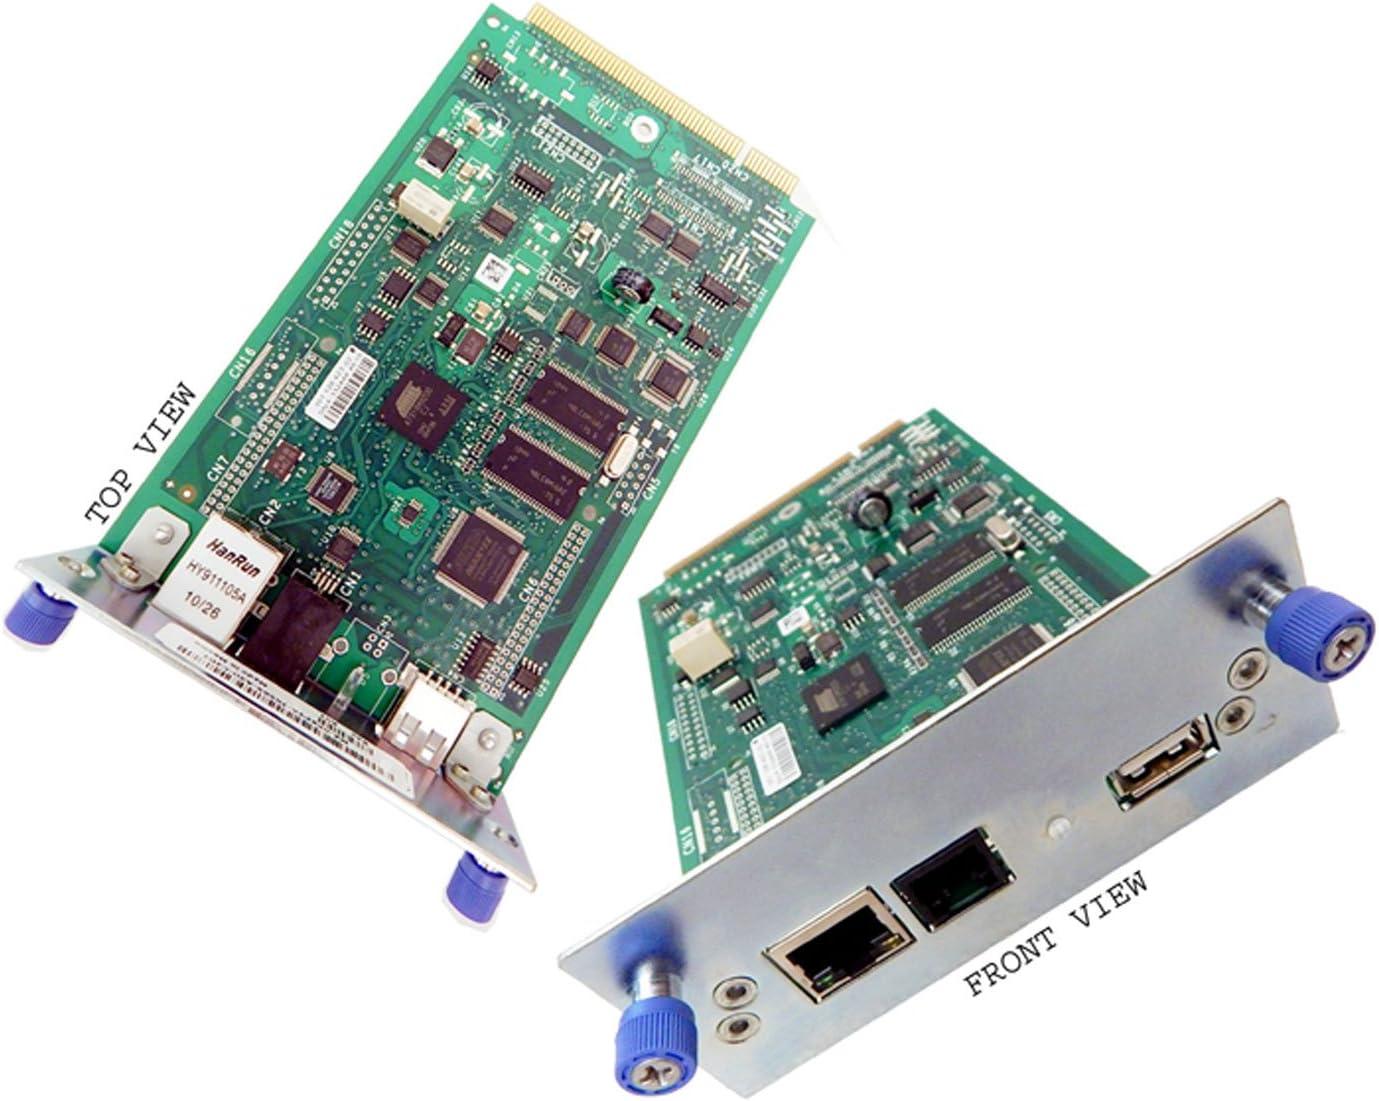 Dell TL2000 TL4000 Ethernet USB Controller Card PXPY6